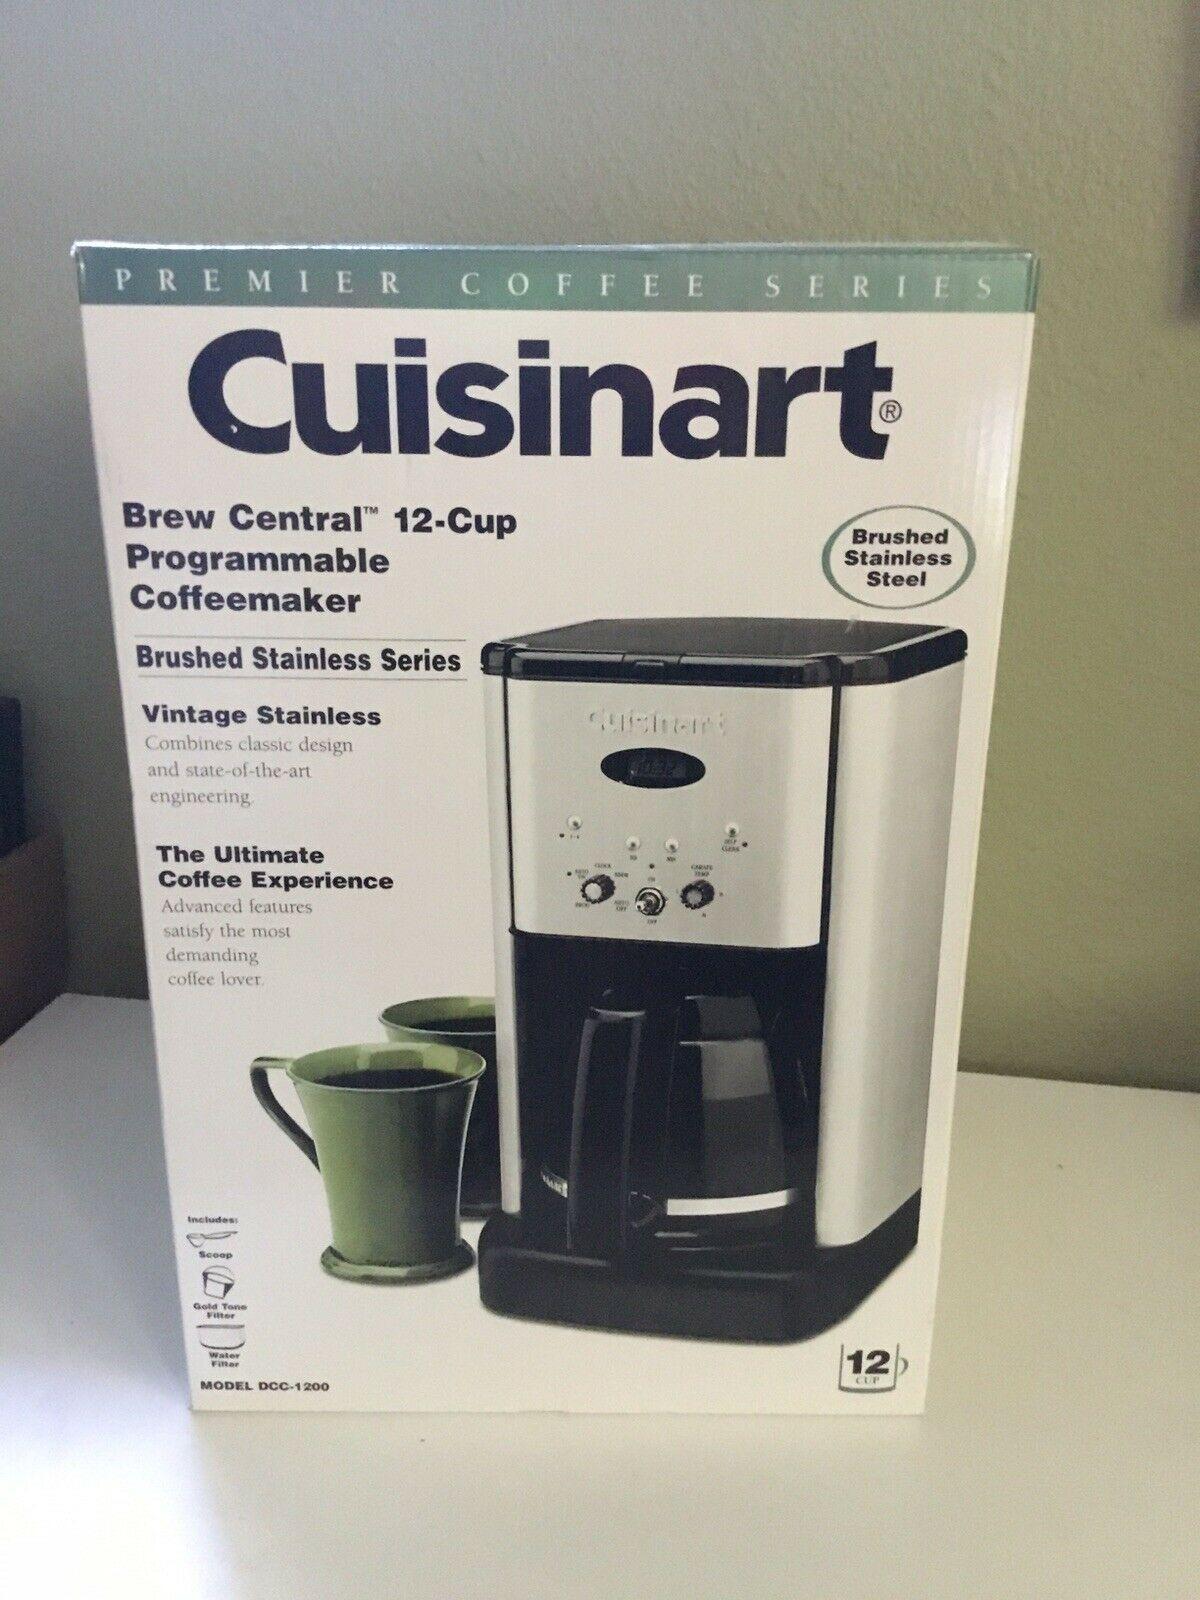 Https Ift Tt 2xbioog Coffee Makers Ideas Of Coffee Makers Coffeemakers Coffee Cuisinart Single Cup Coffee Maker Cuisinart Coffee Maker Coffee Maker